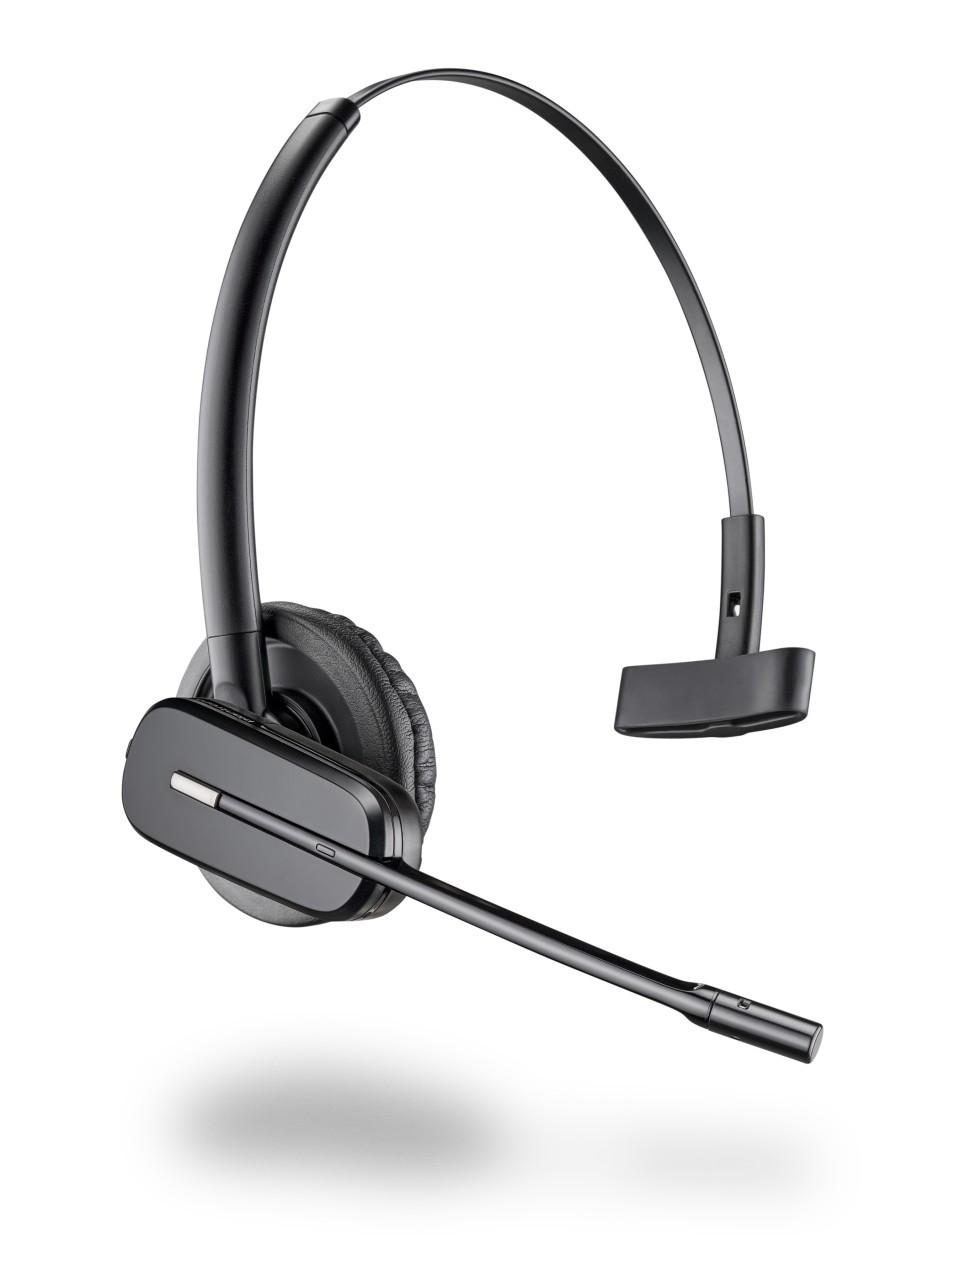 Mitel Compatible Plantronics Cs 540 Wireless Headset Convertible 84693 01 Cs540 Wireless 520 Dect Plantronics Wireless Cs540 Headset